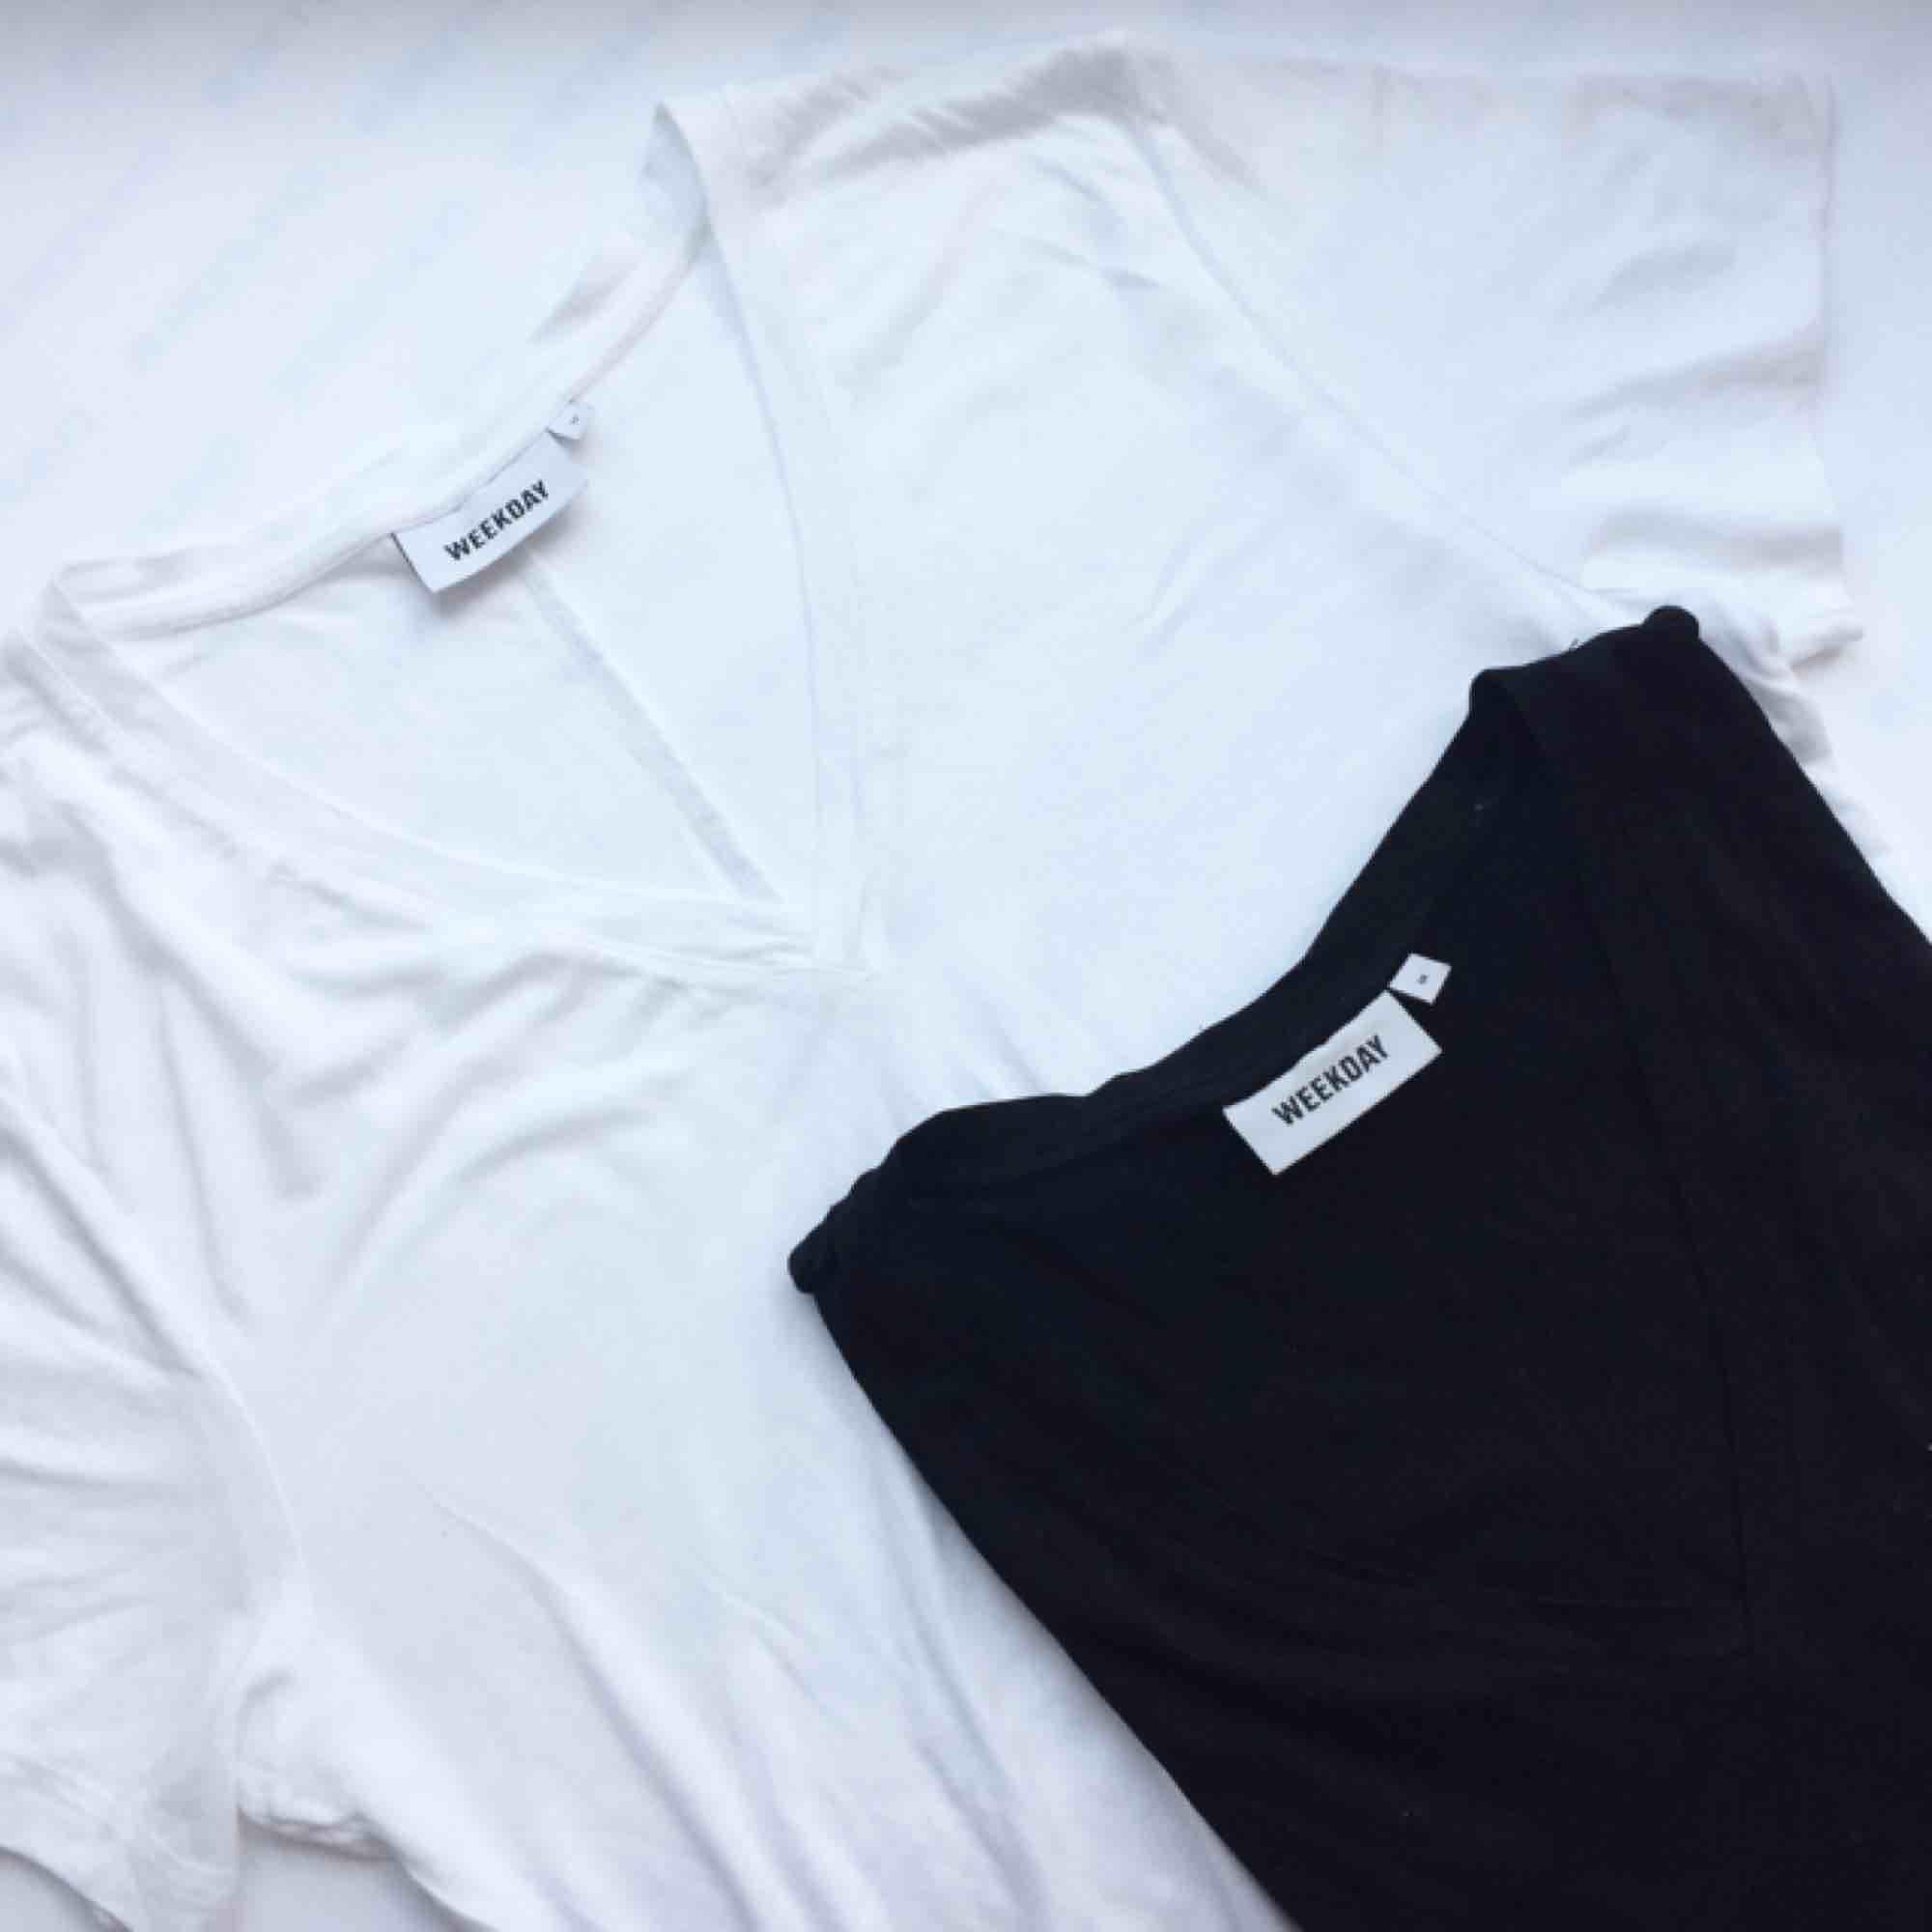 f87058ab235d Sparsamt använda T-shirts. En svart - Weekday T-shirts - Second Hand